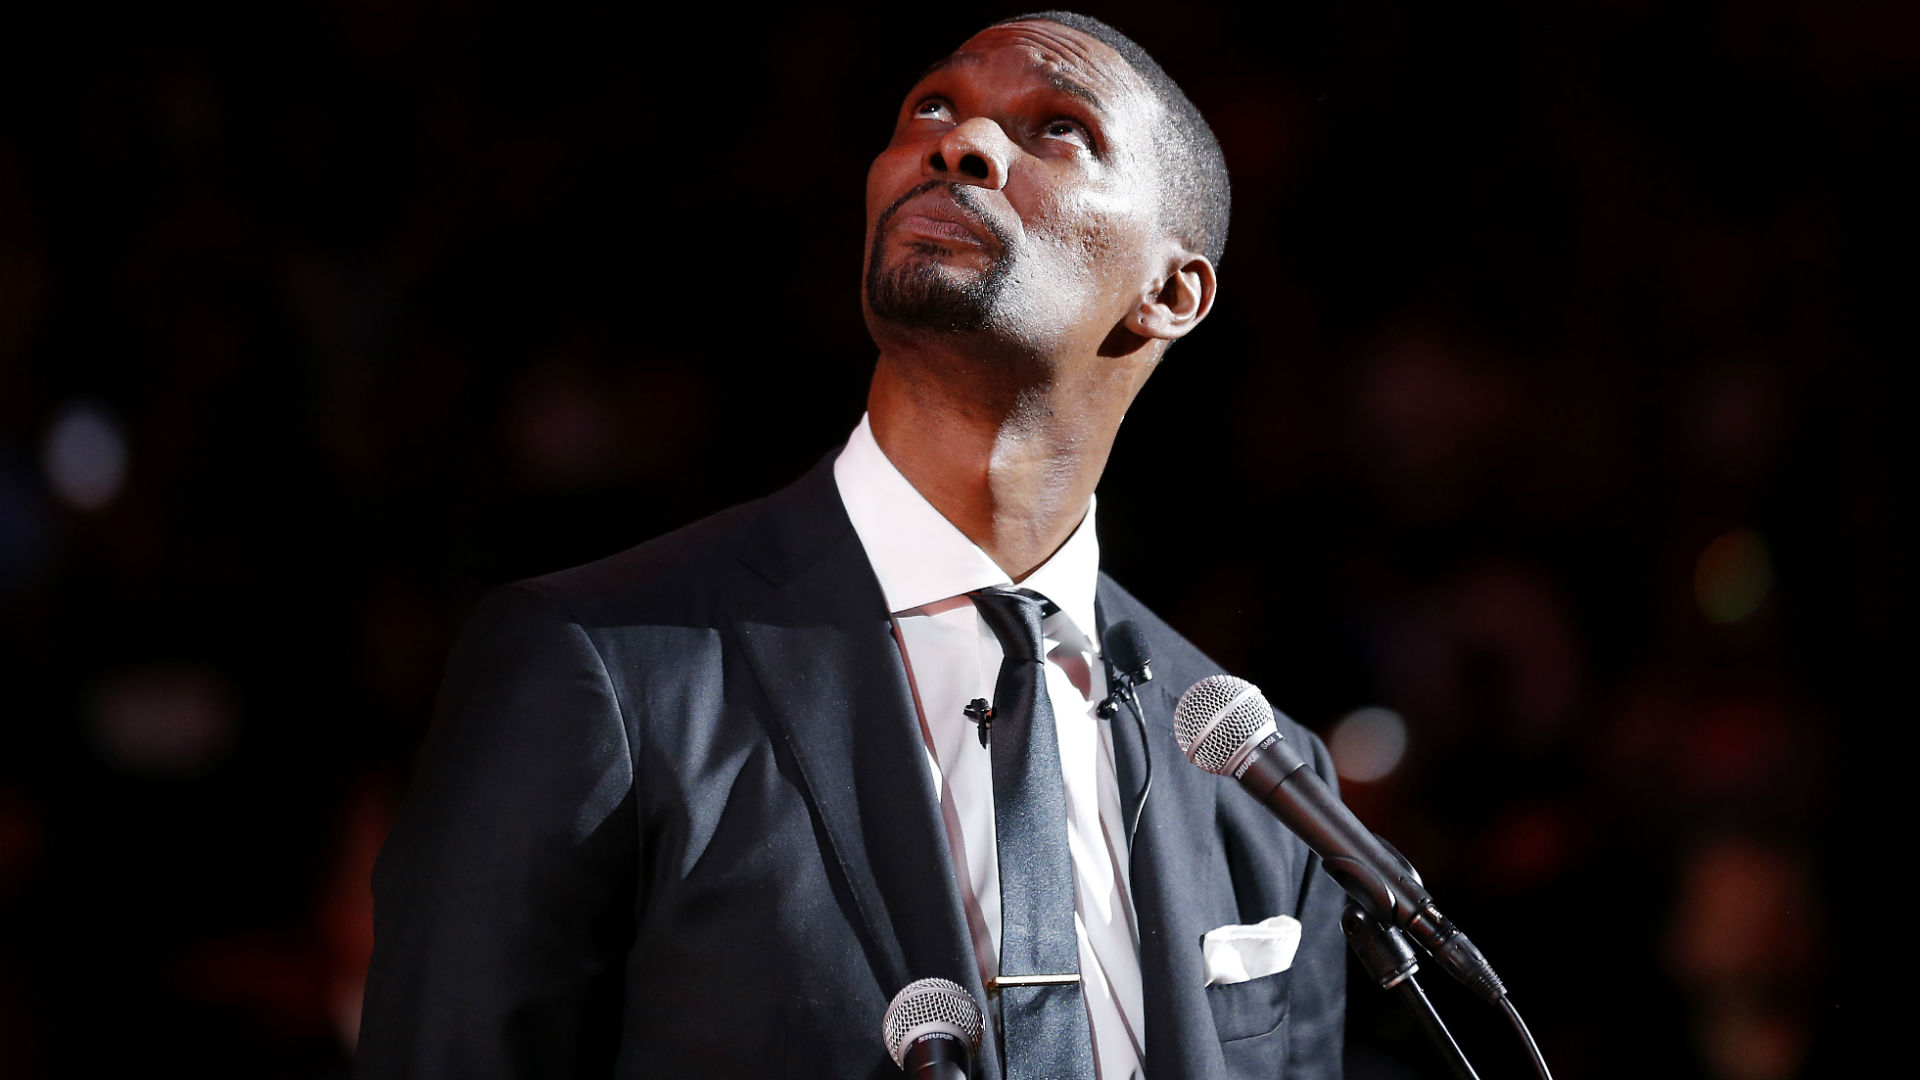 Heat honour Bosh with jersey retirement, tribute video